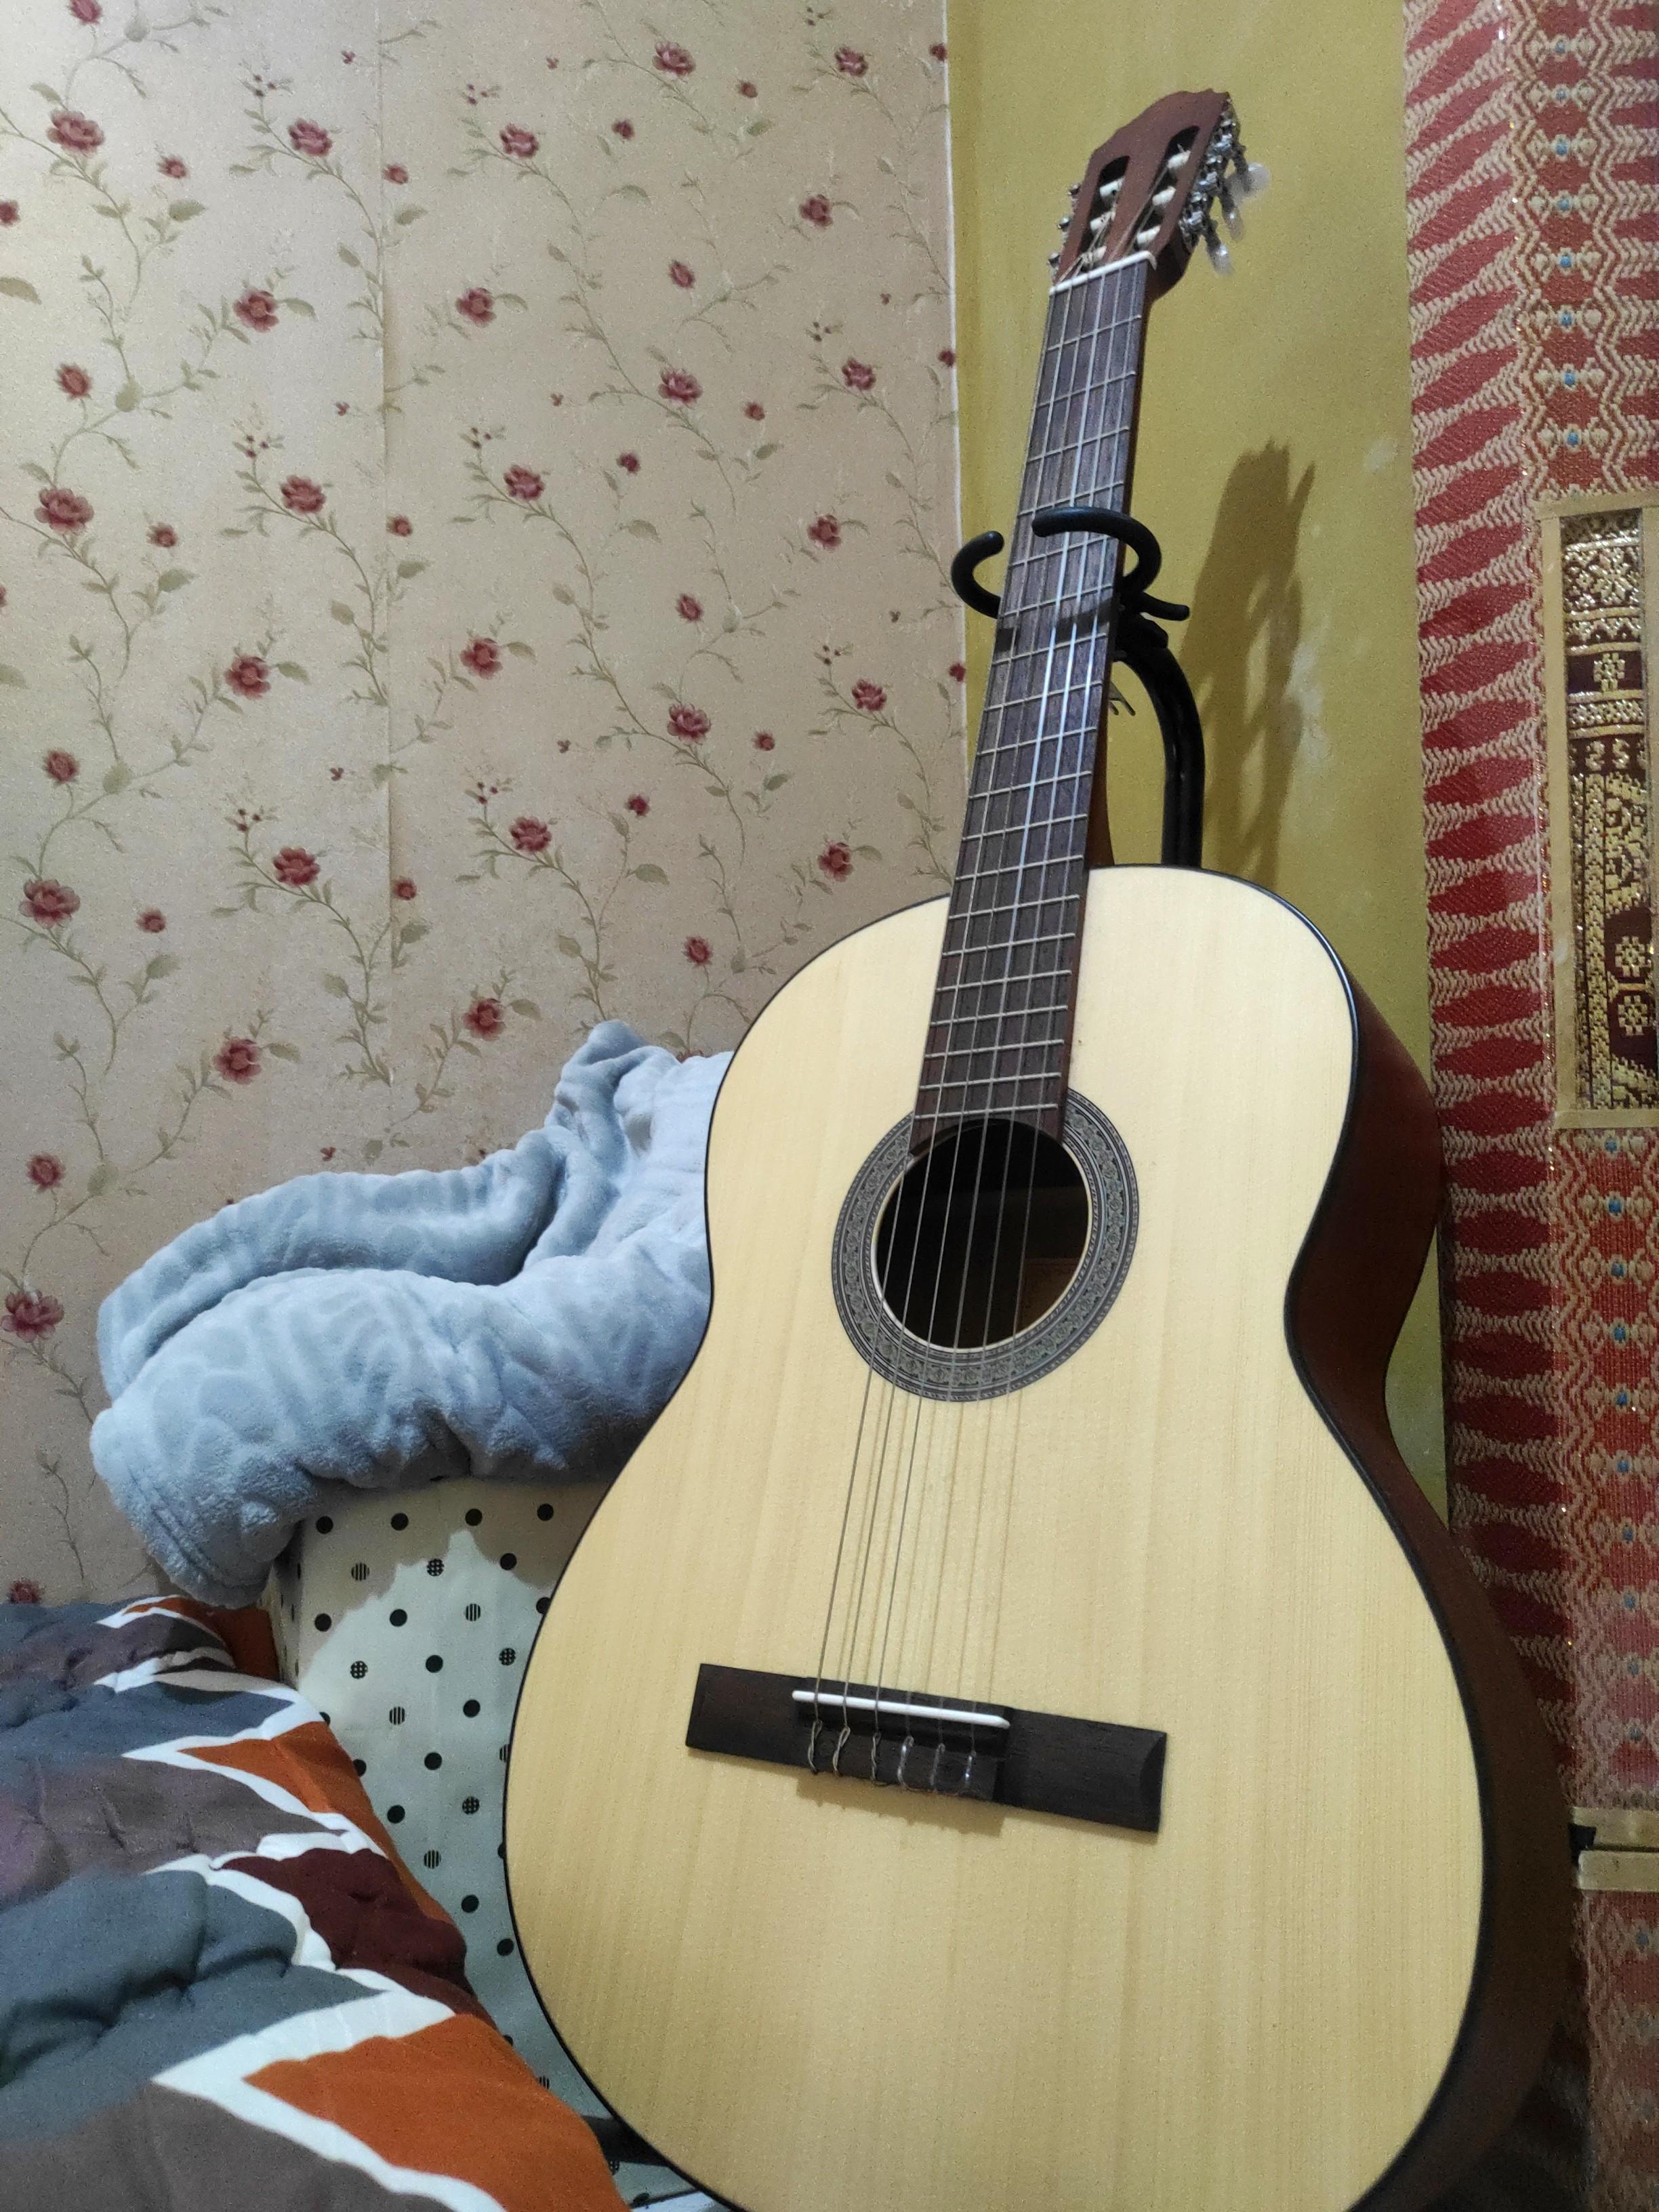 Cort Guitar AC100 0P + Stand Guitar + Capo + Guitar Bag